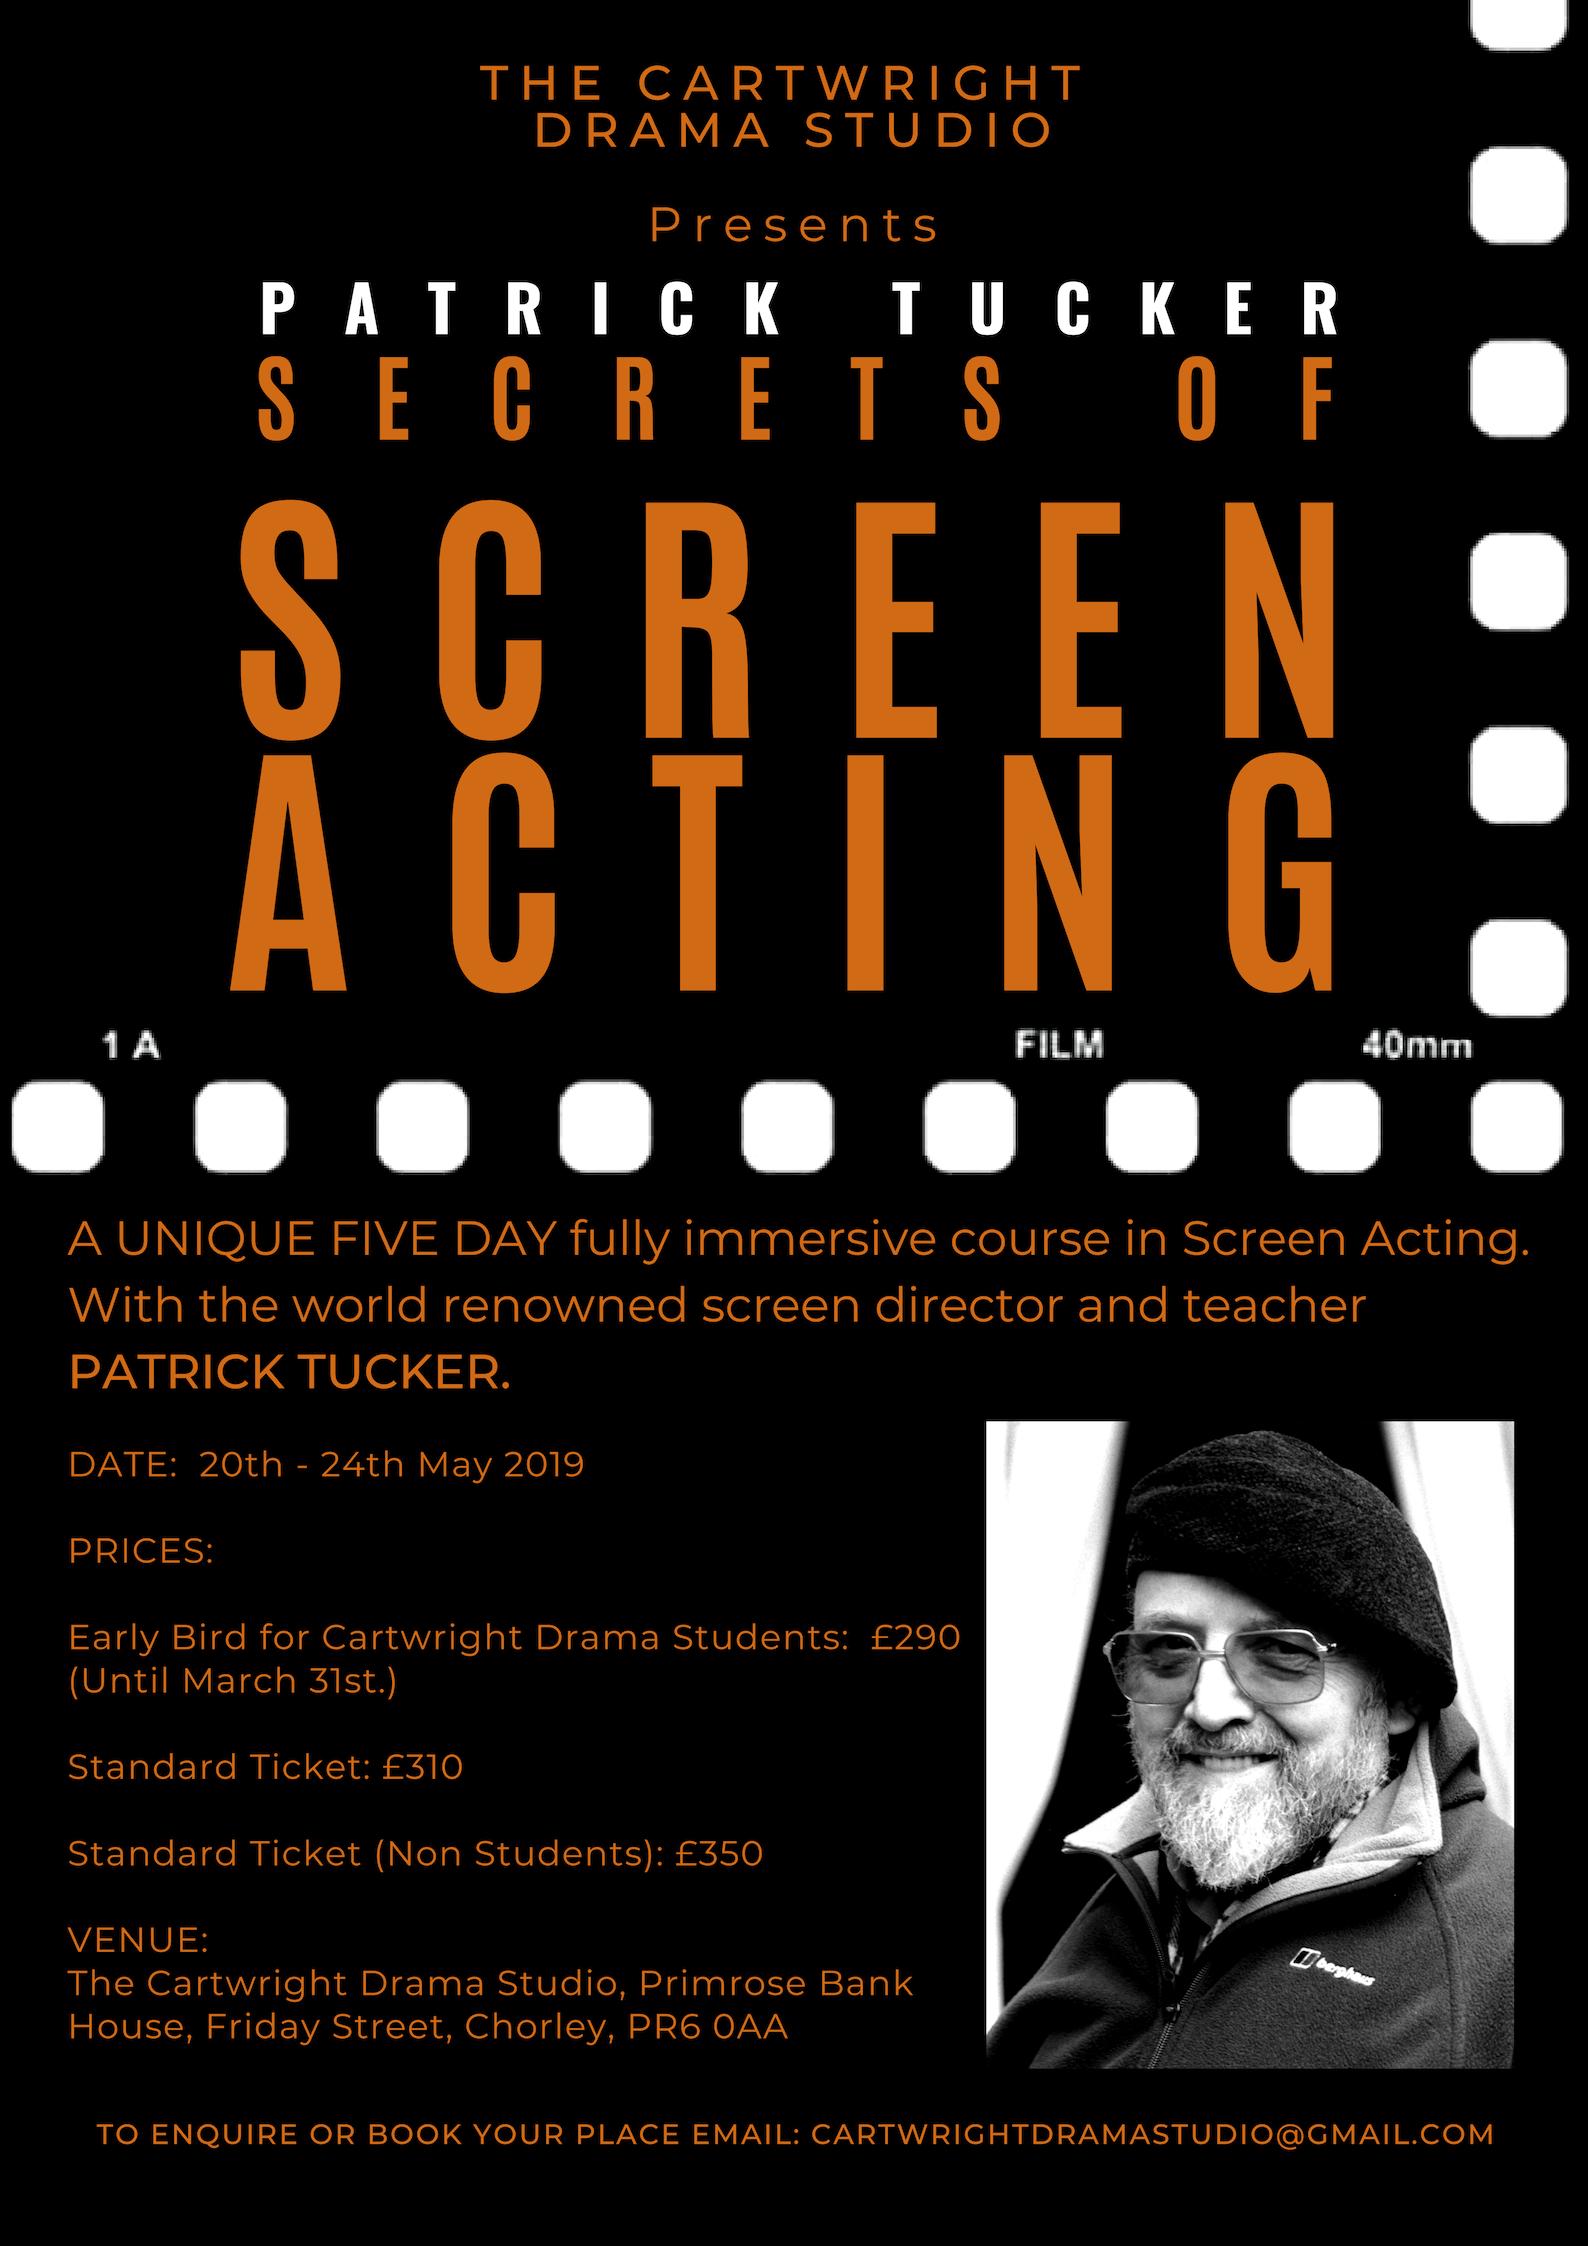 Cartwright Drama Studio Presents Secrets of Screen Acting Image 2